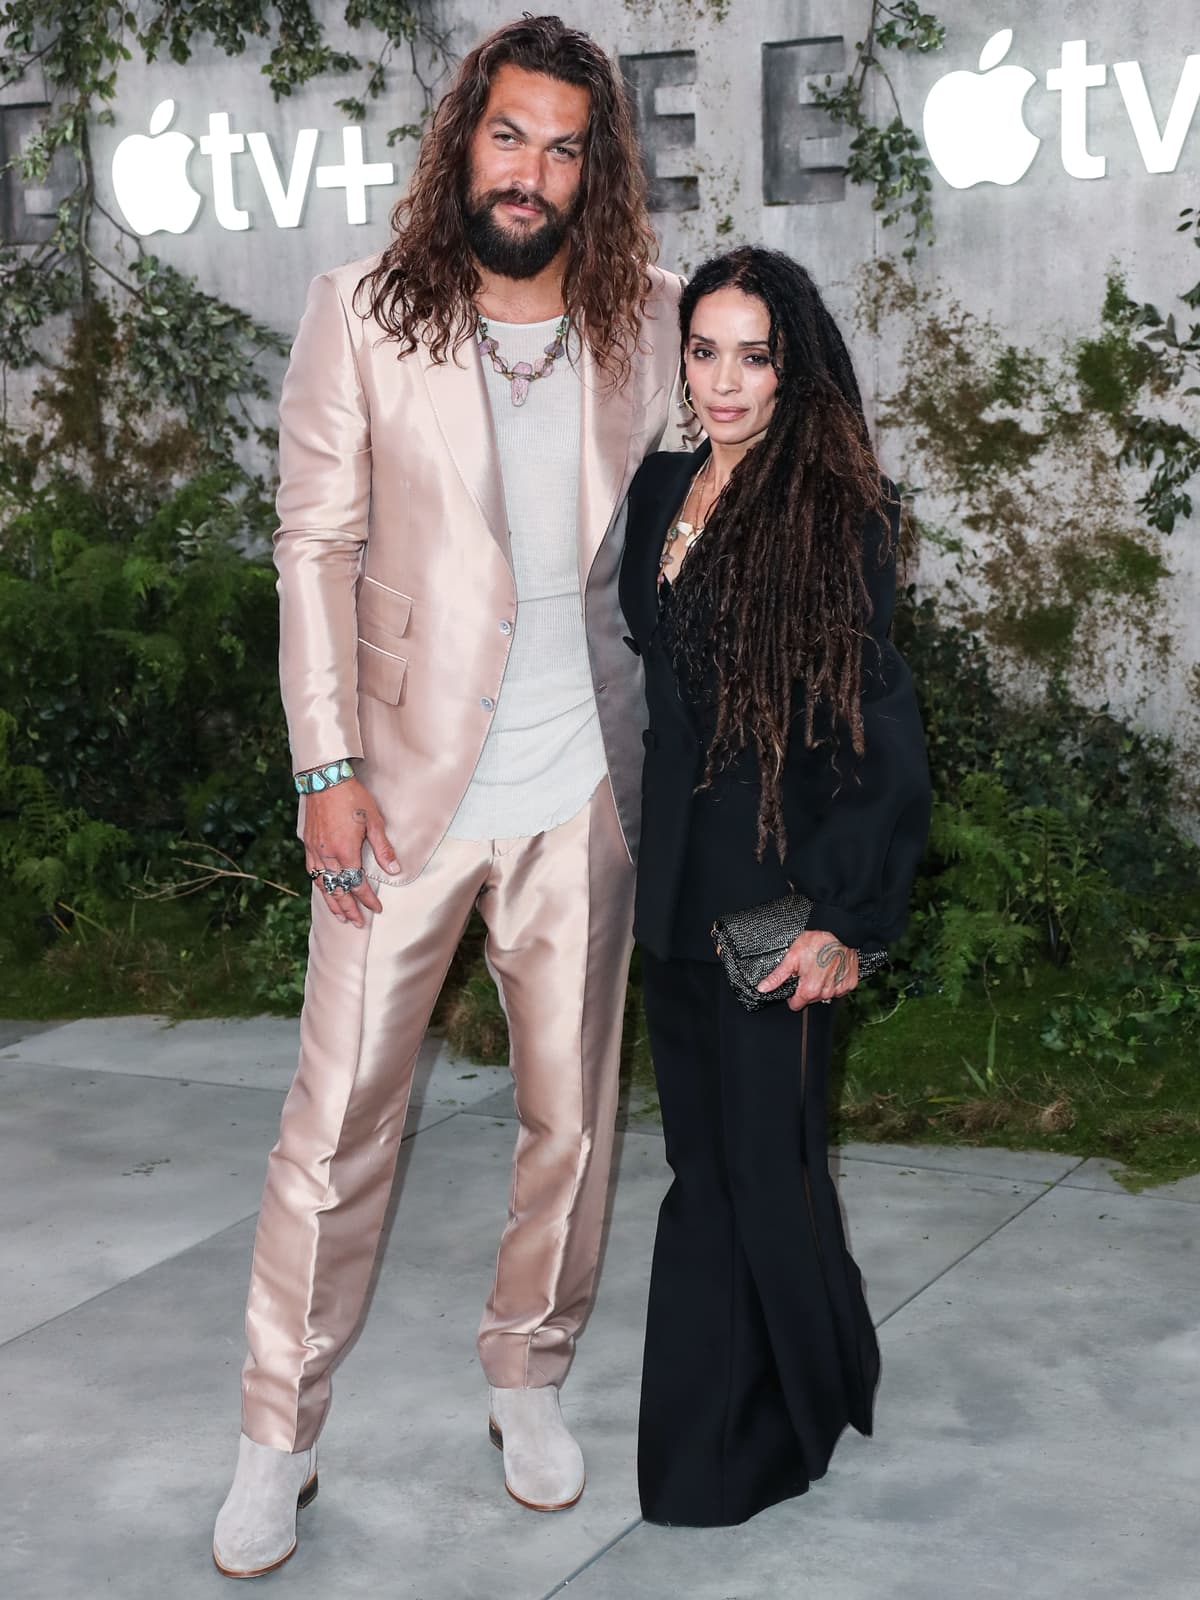 Actor Jason Momoa and wife/actress Lisa Bonet